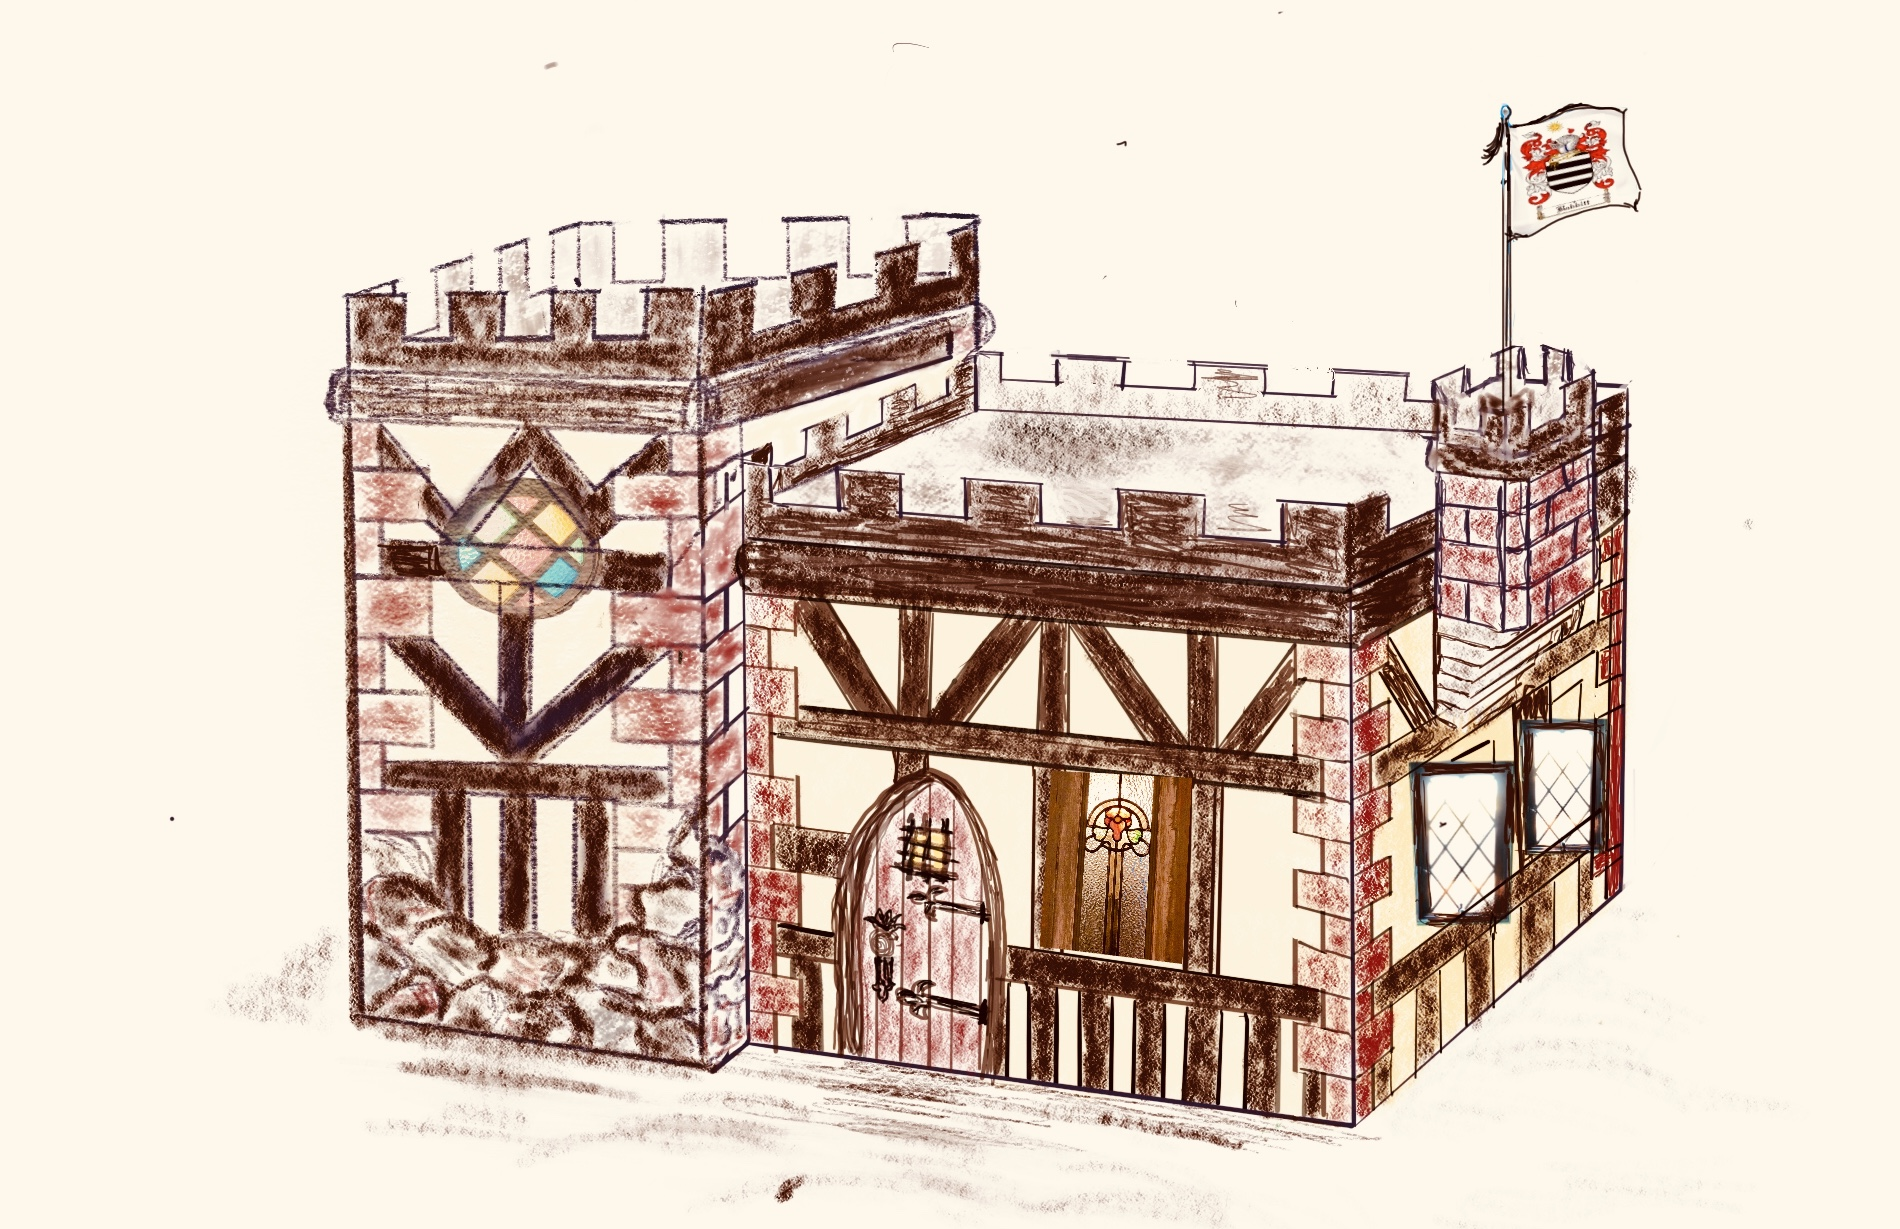 Havenwald Tiny Tudor Castle rendering